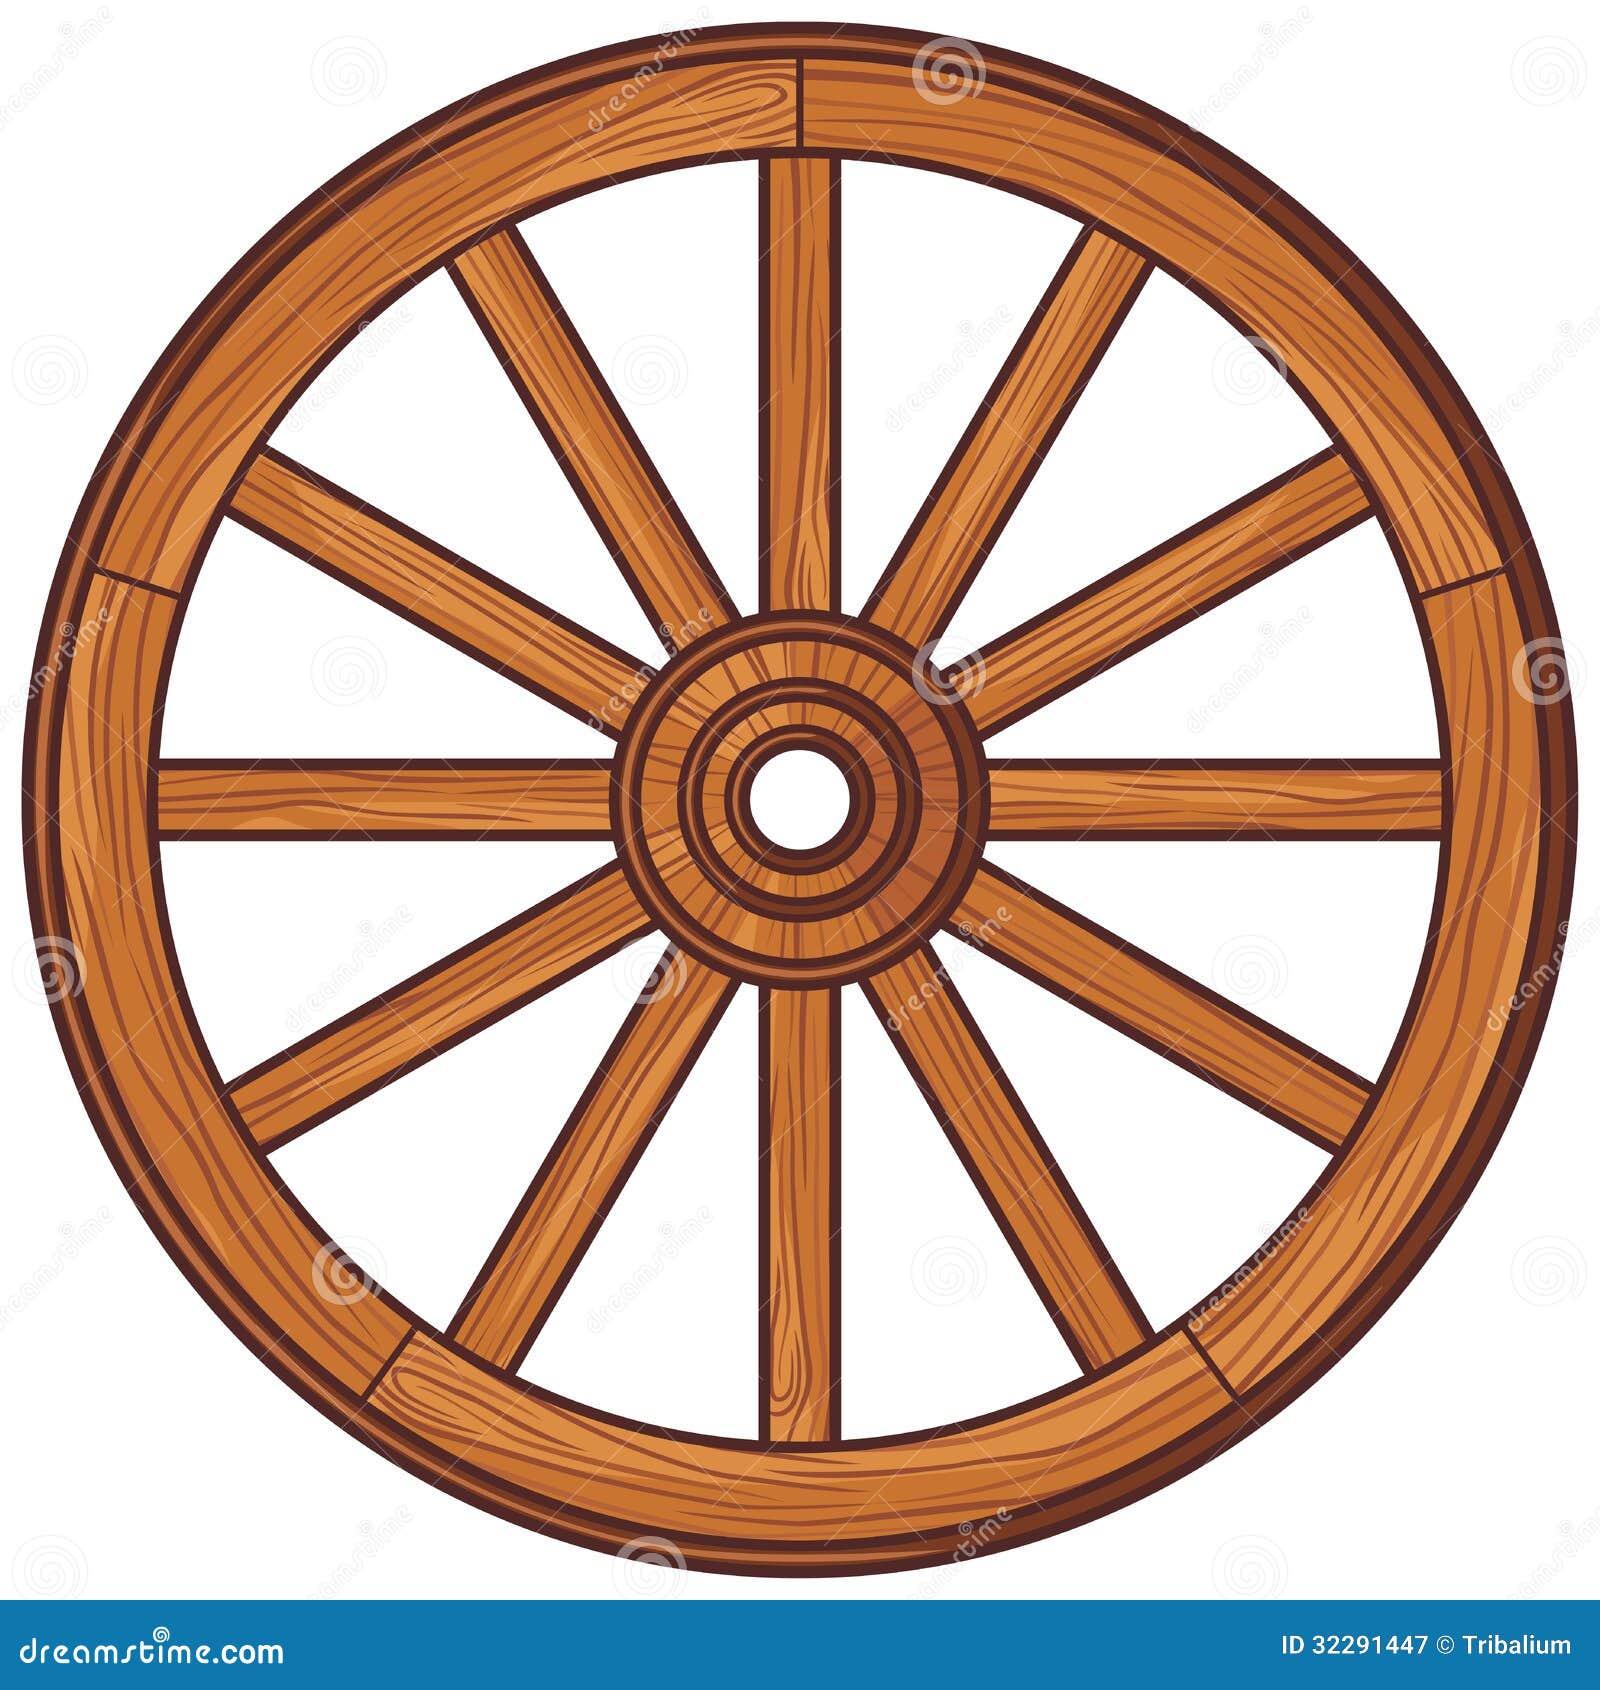 roue en bois image stock image du rustique pays. Black Bedroom Furniture Sets. Home Design Ideas